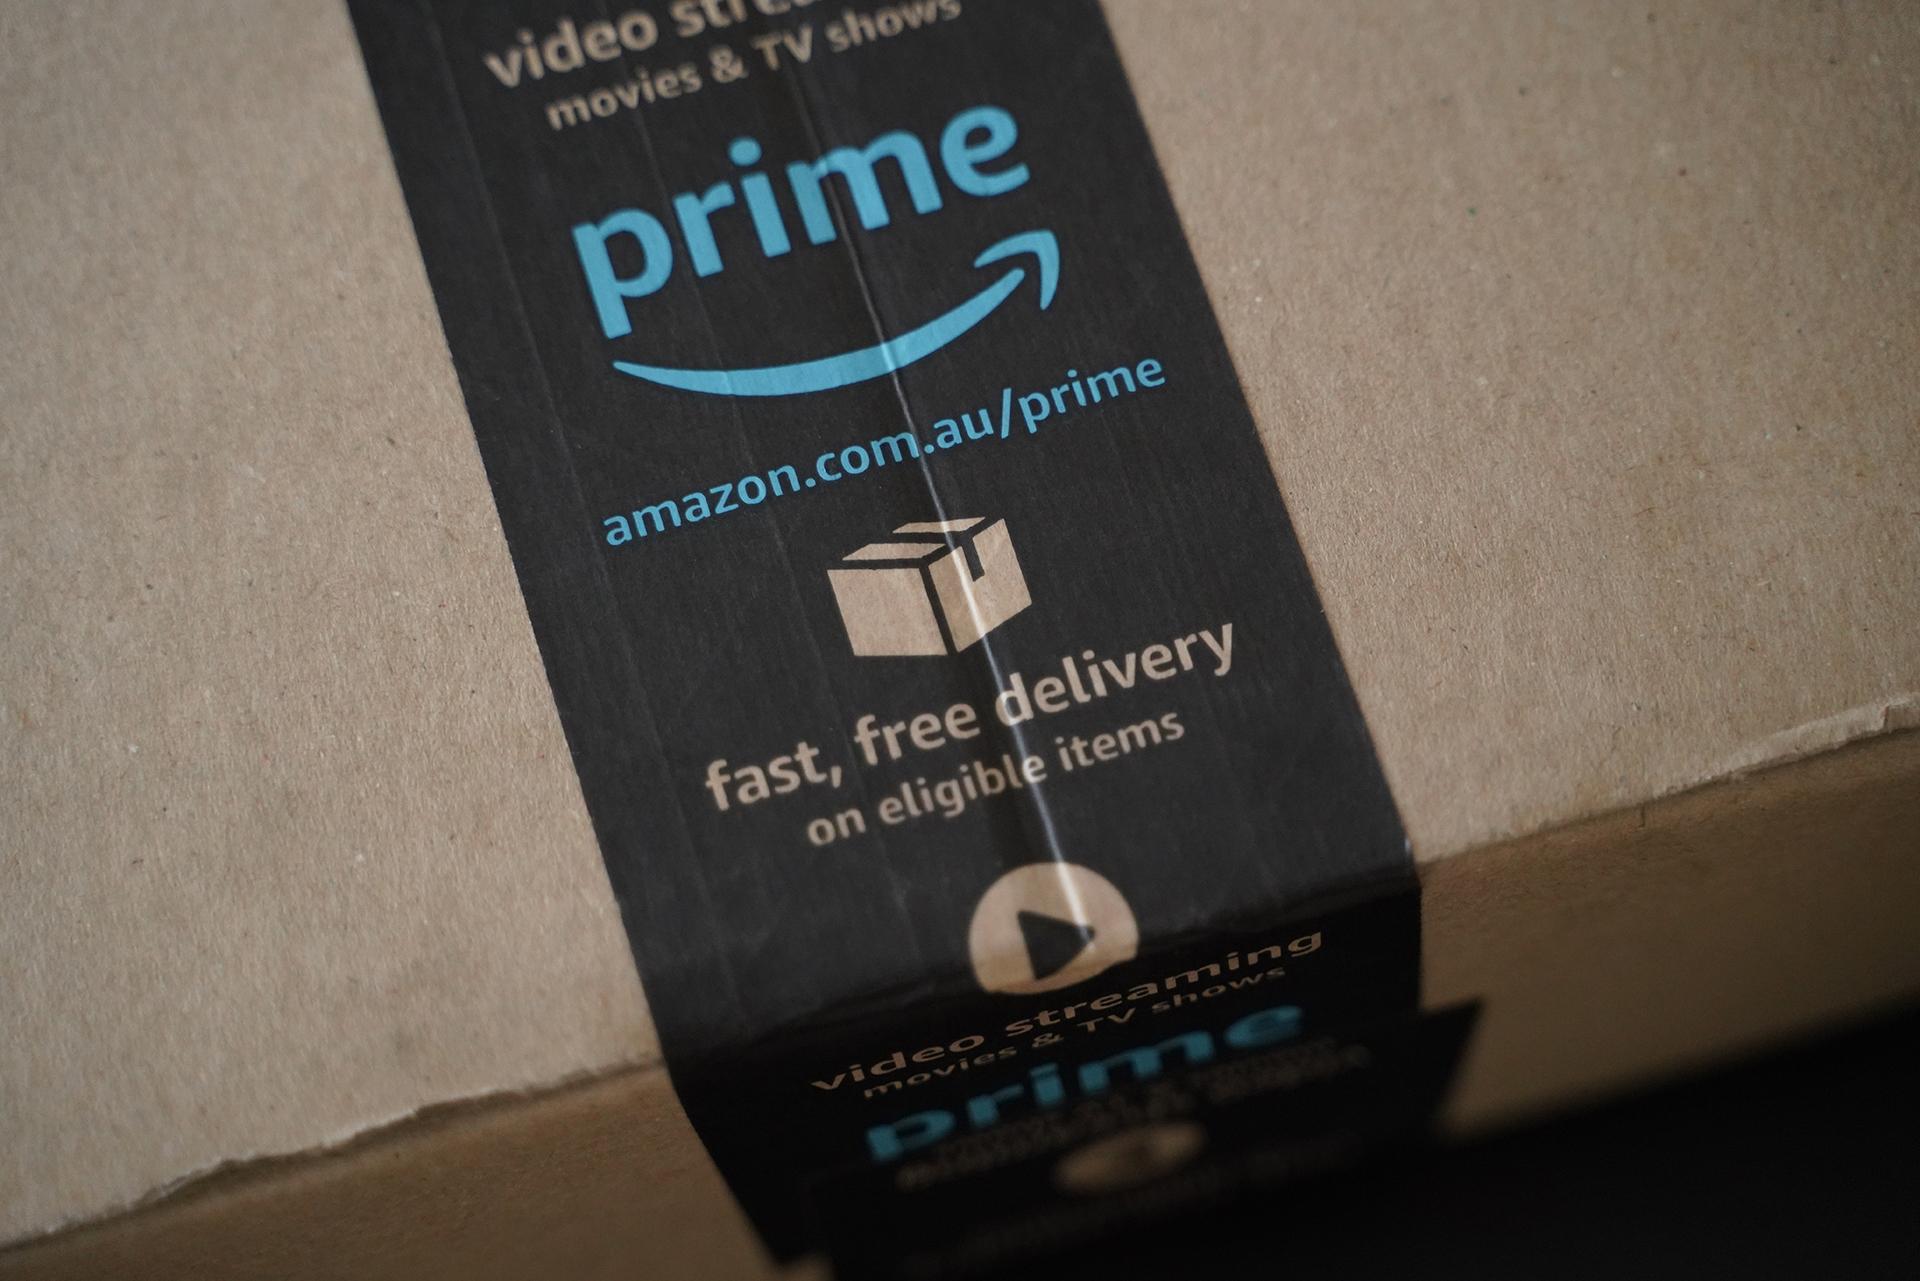 Australia's fight against Big Tech: Amazon, eBay under the Canberra microscope in ecommerce probe